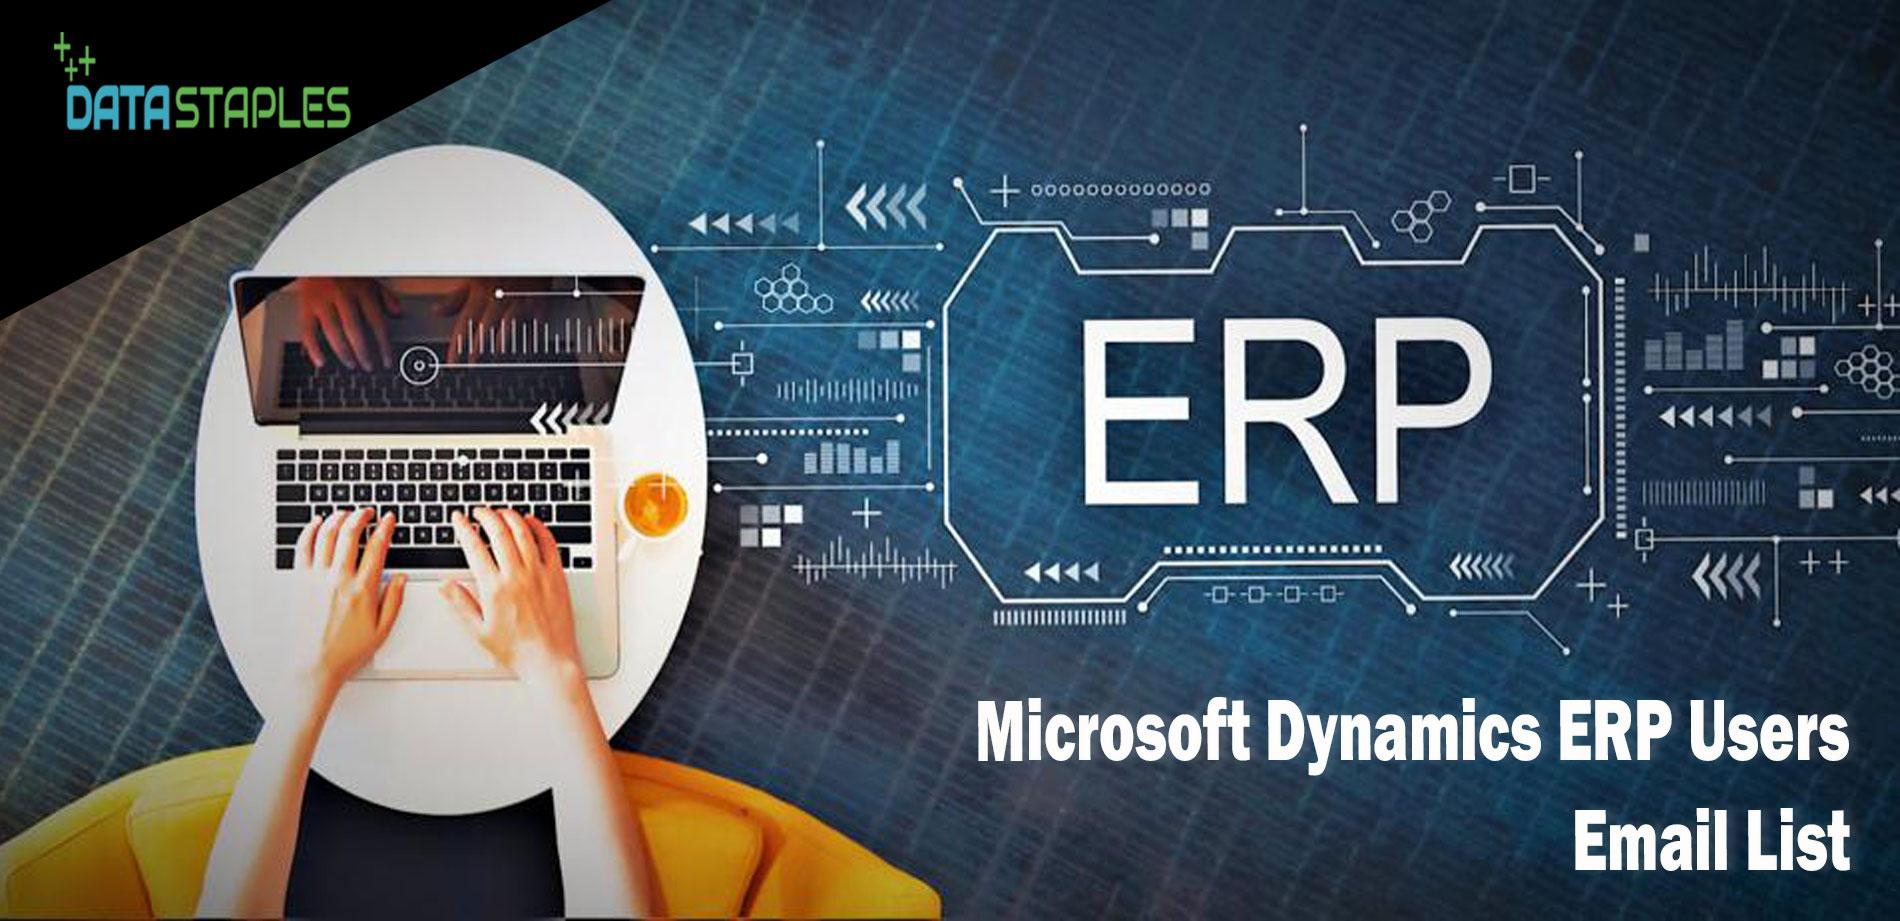 Microsoft Dynamics ERP Users Email List   DataStaples